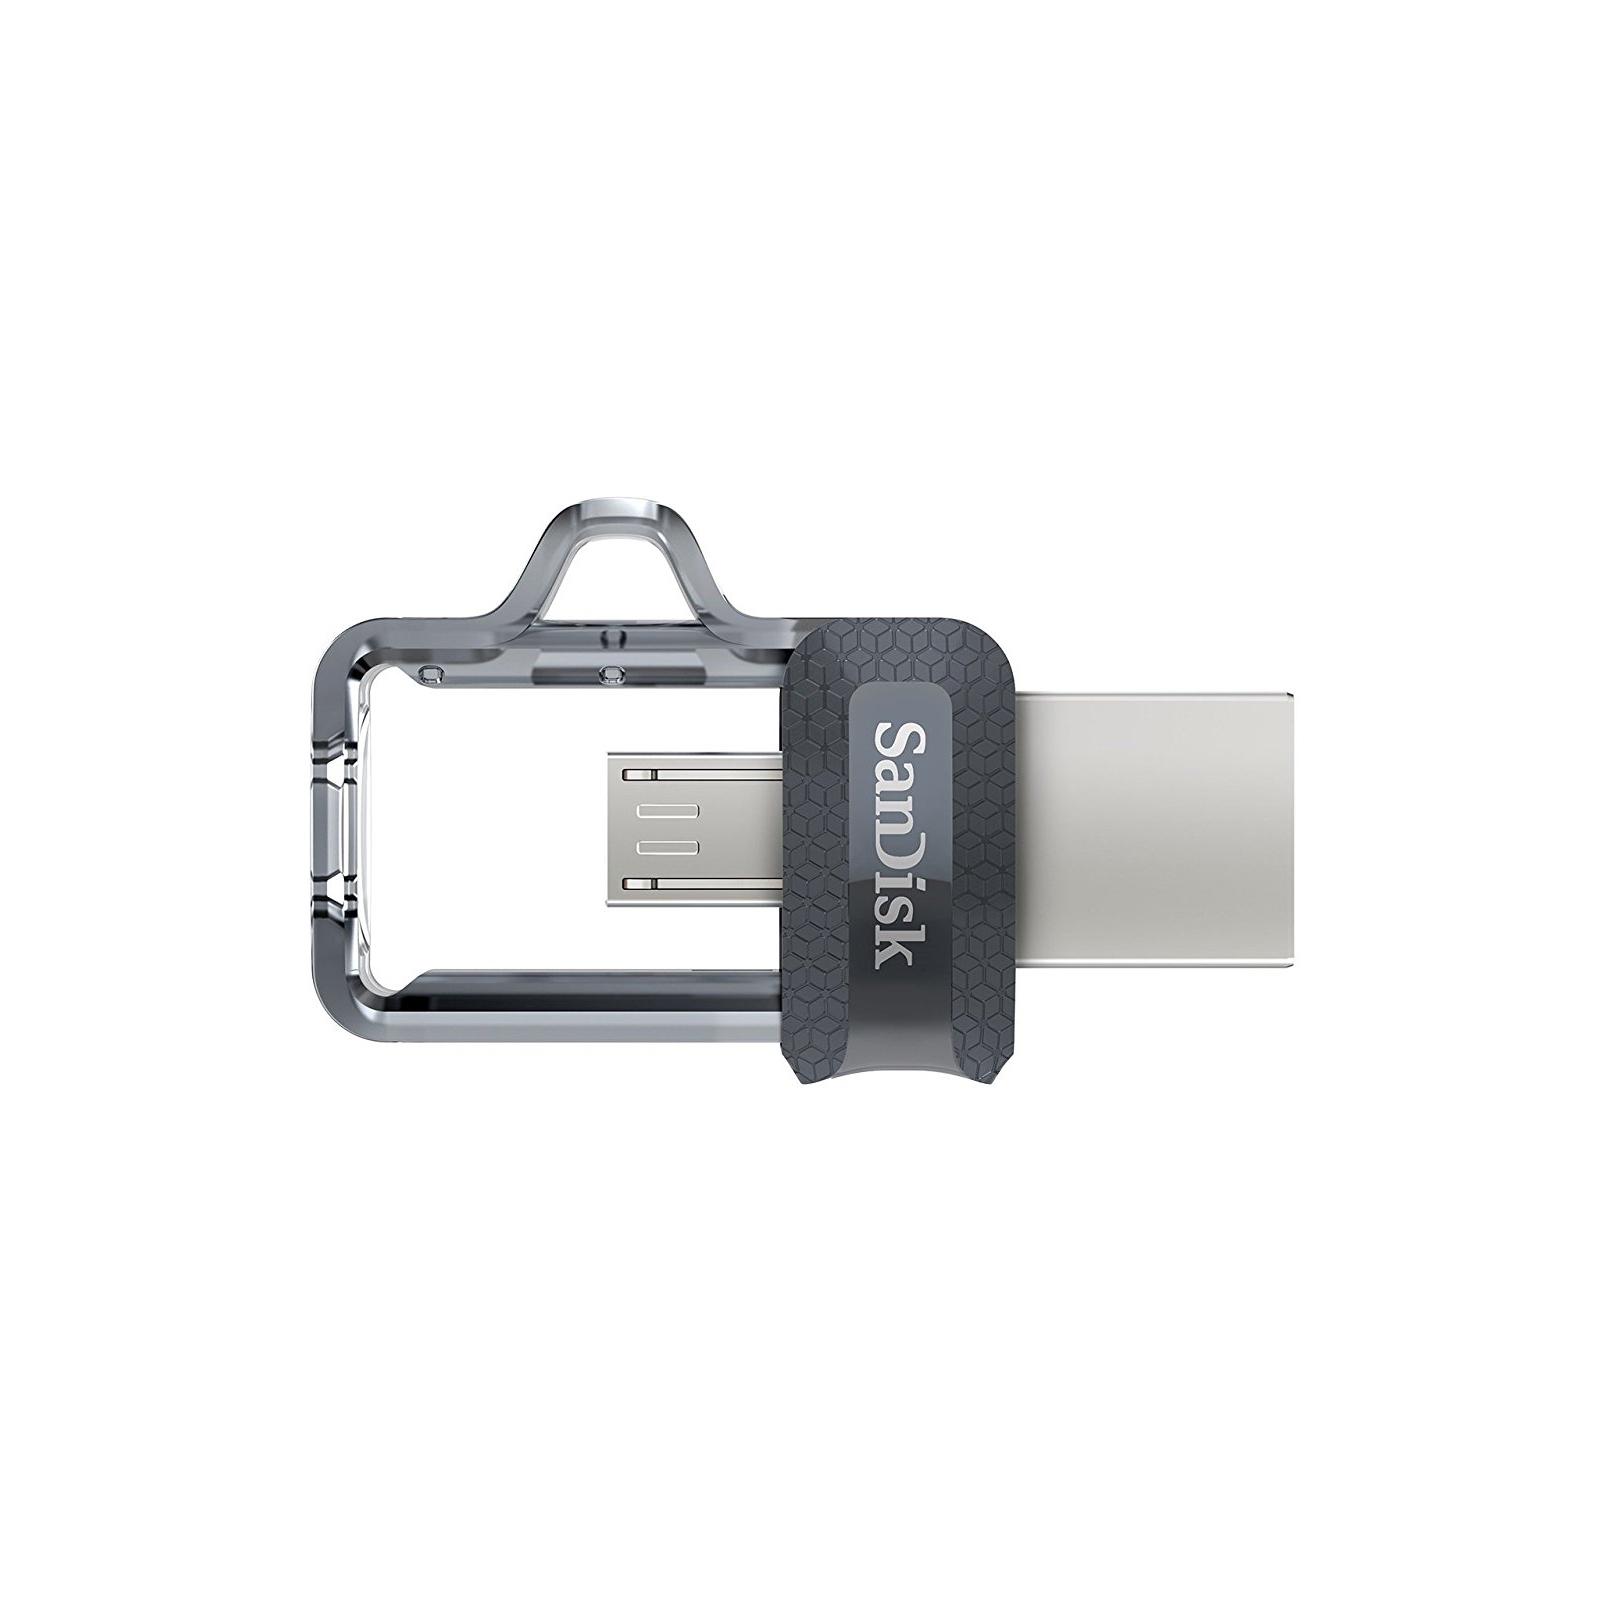 USB флеш накопитель SanDisk 64GB Ultra Dual Black USB 3.0 OTG (SDDD3-064G-G46) изображение 3